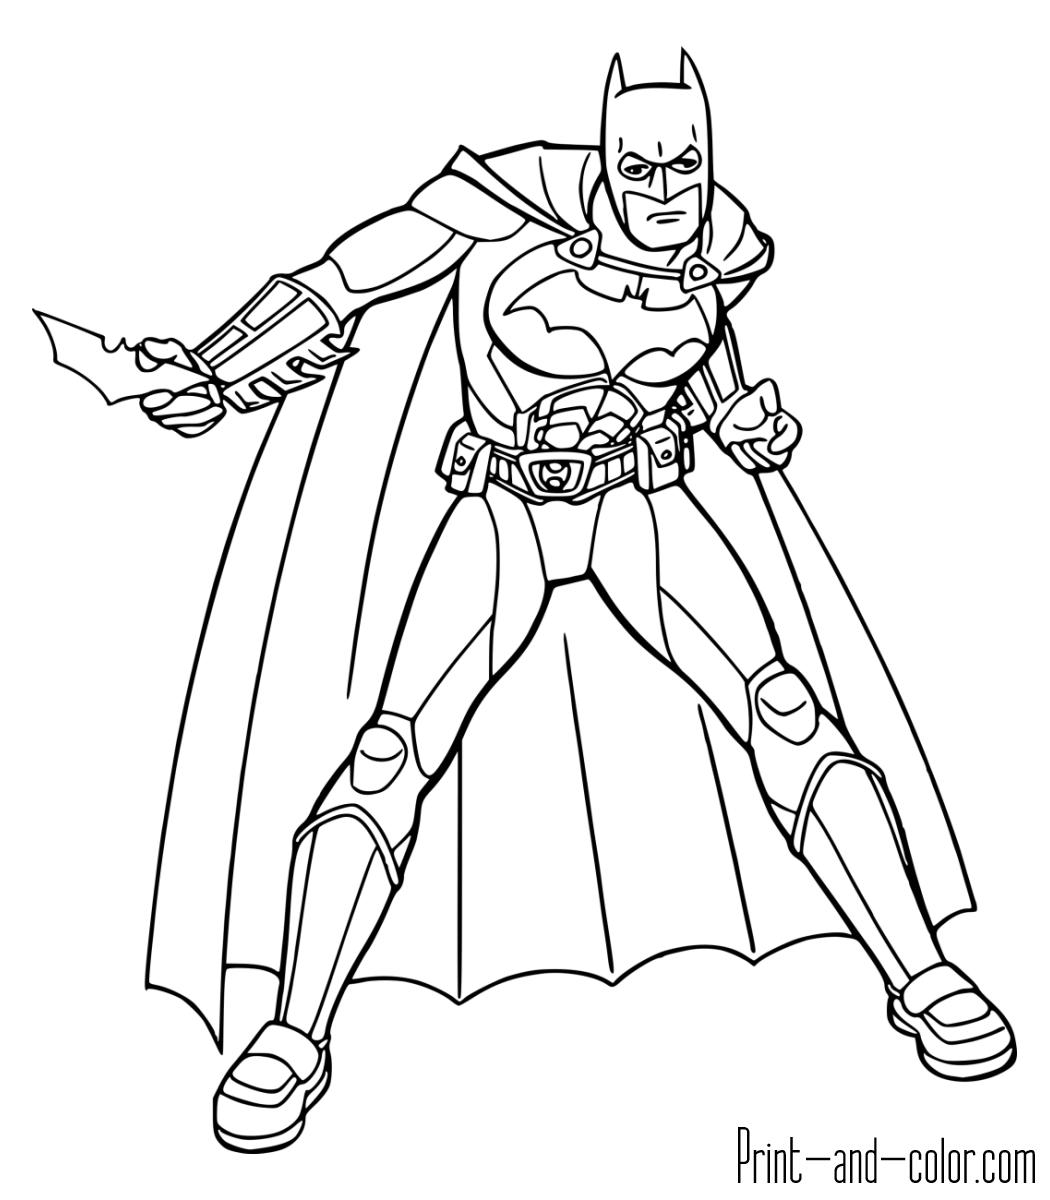 coloring sheet batman batman coloring pages sheet coloring batman